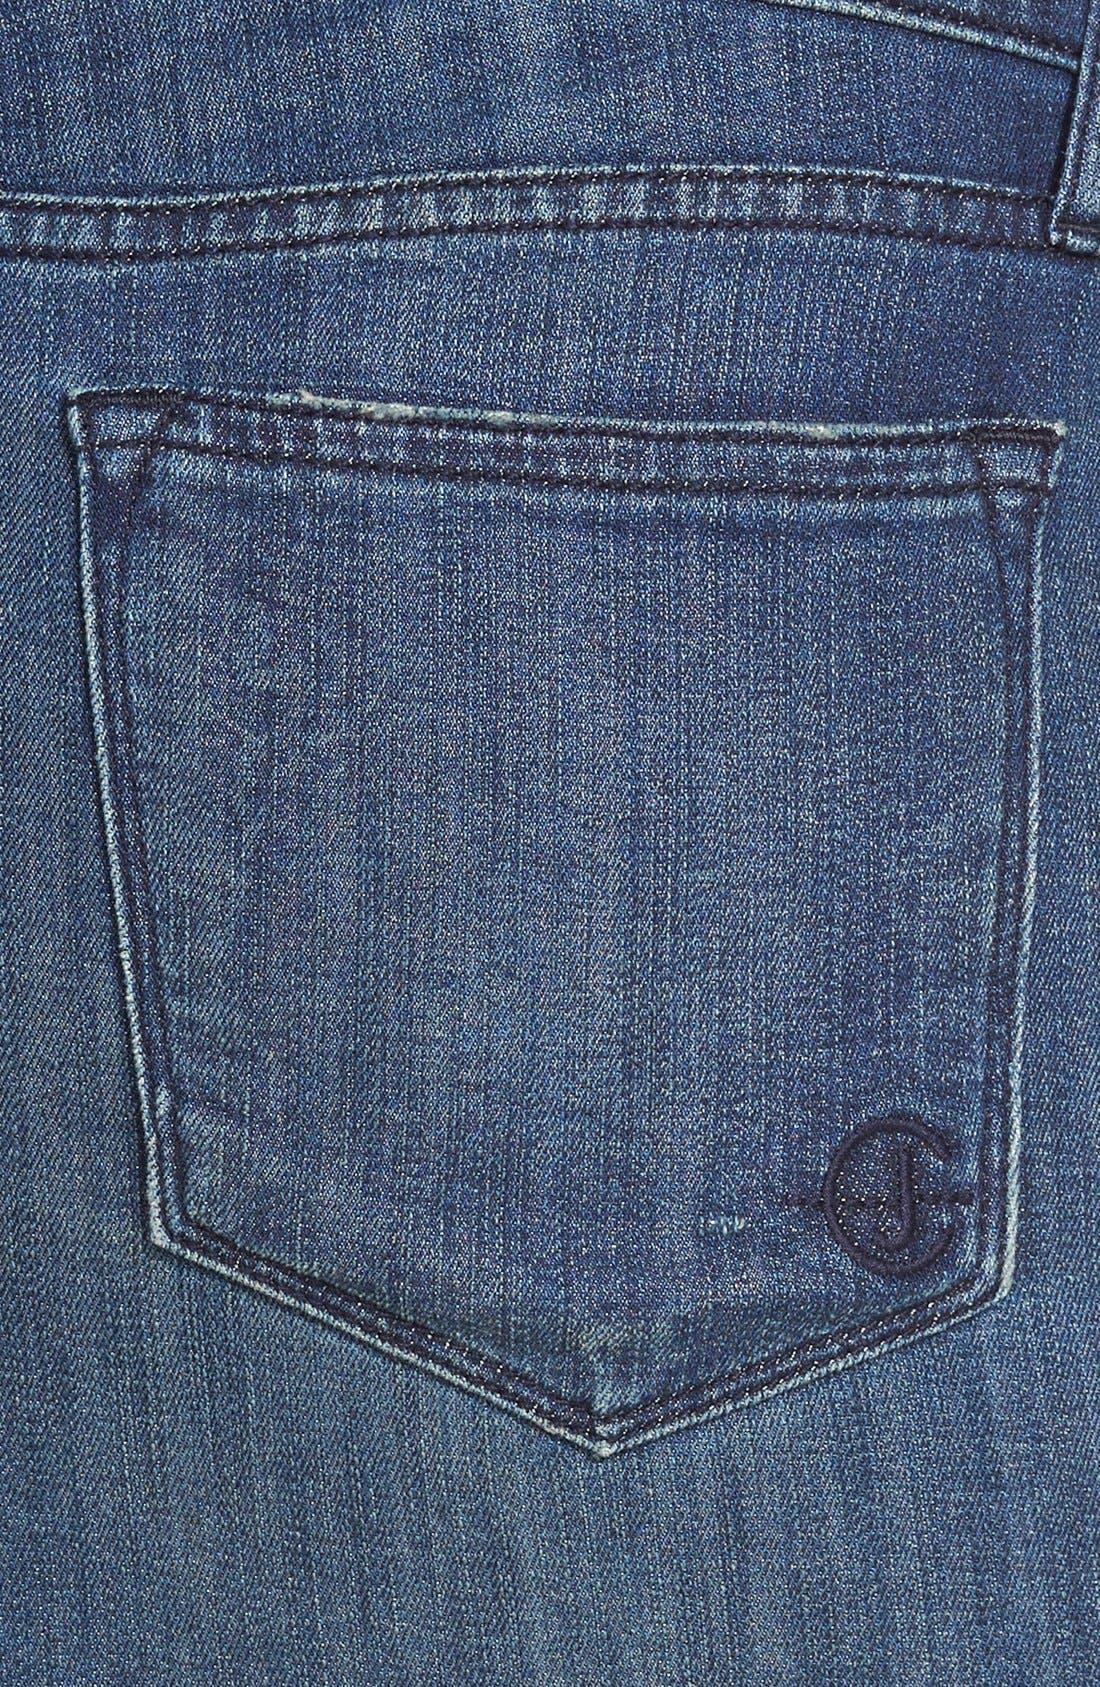 Alternate Image 3  - CJ by Cookie Johnson 'Kind' Boho Denim Maxi Skirt